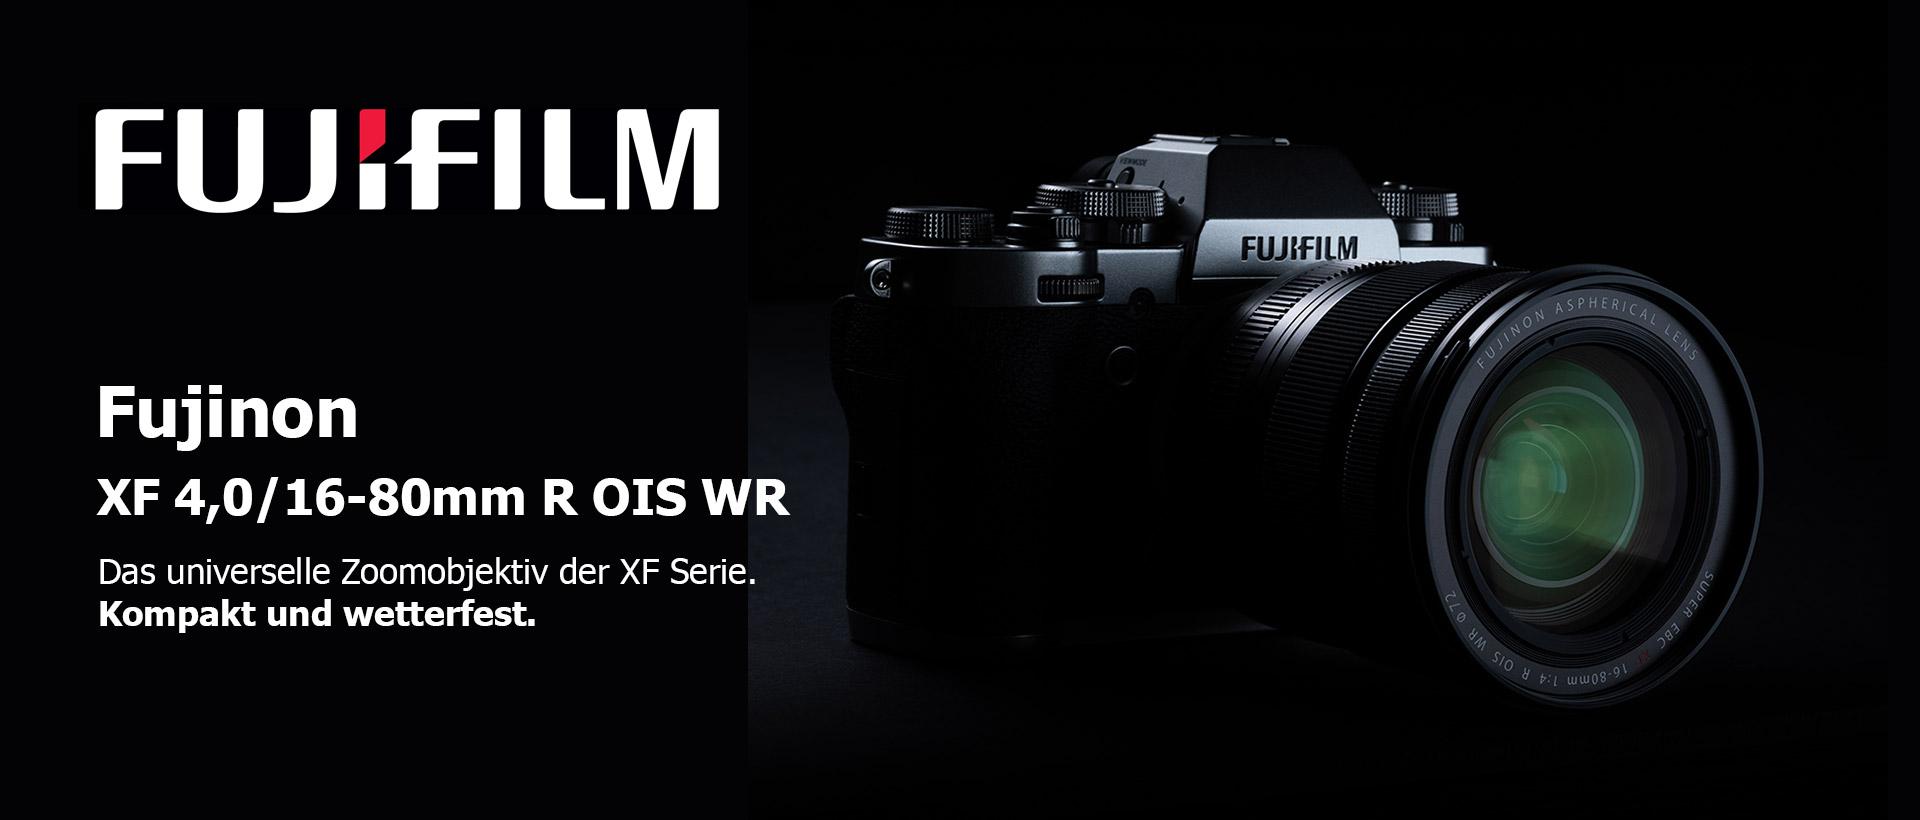 Fujinon XF 4,0/16-80mm R OIS WR